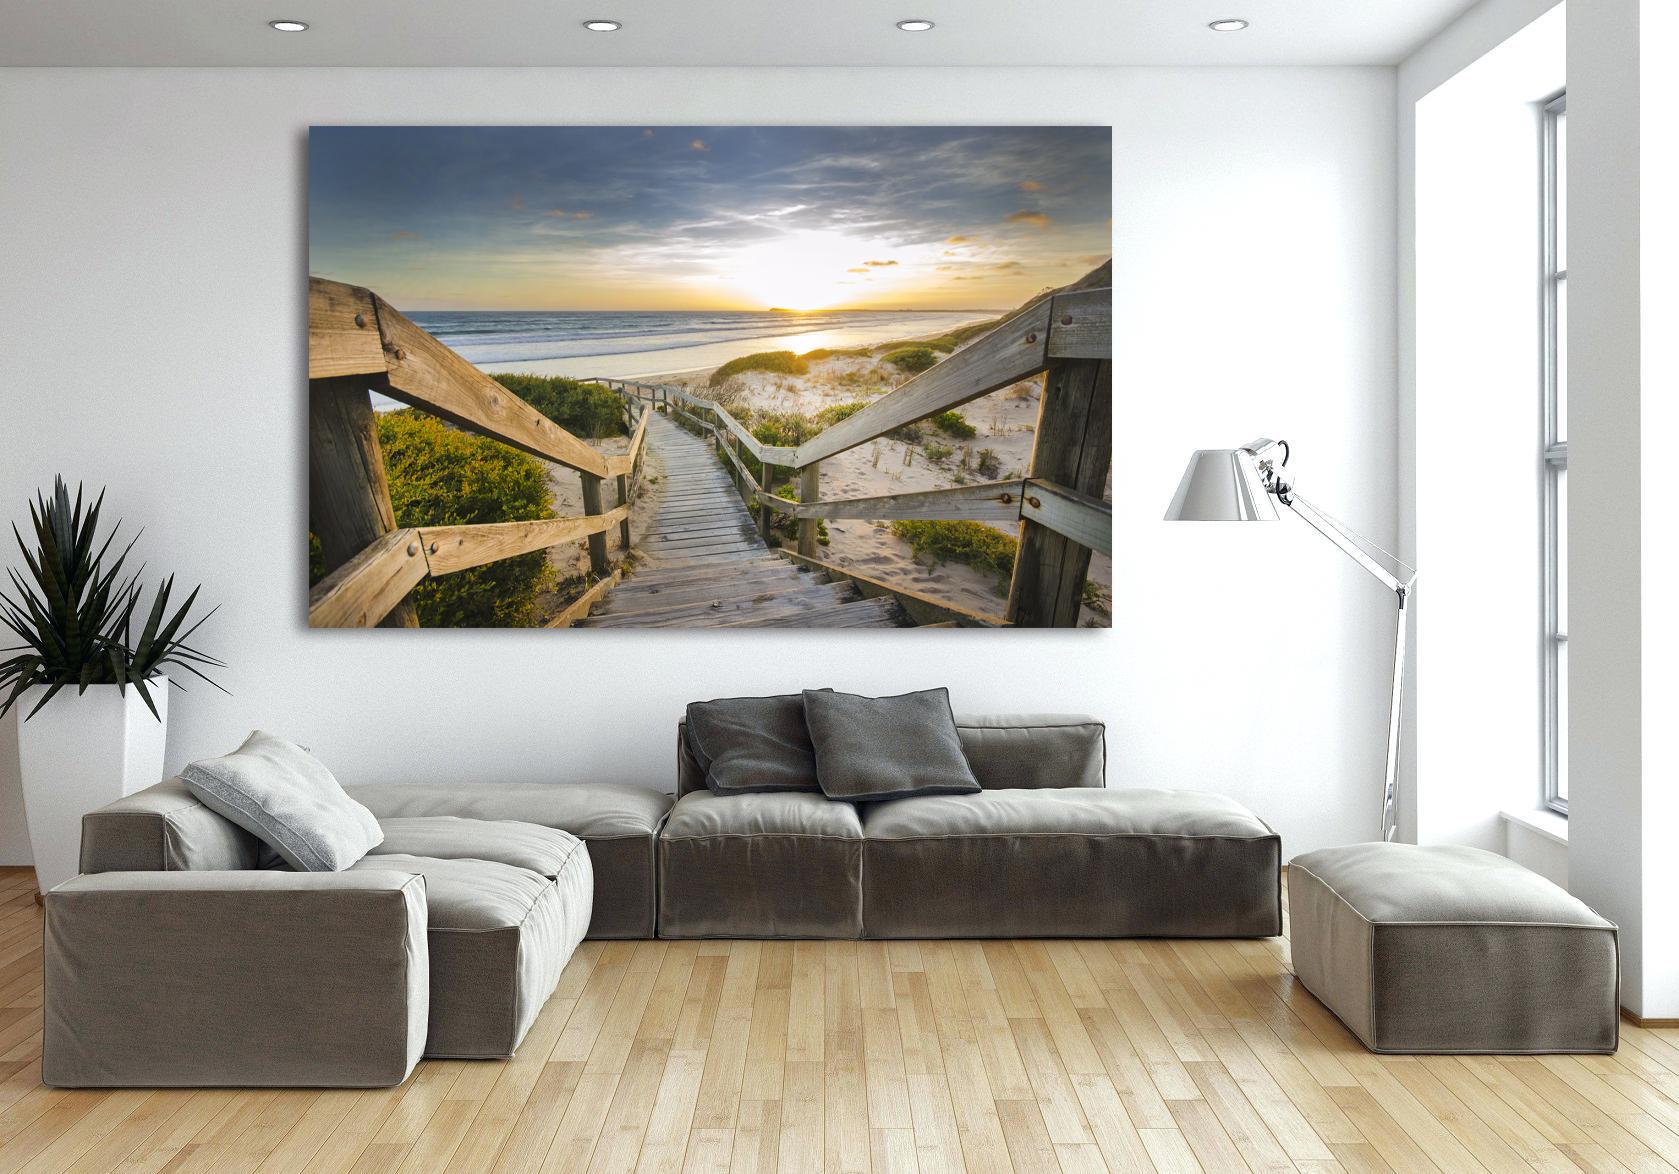 wall-ideas-extra-large-wall-art-ideas-canvas-wall-art-ideas-in-extra-large-framed-wall-art.jpg